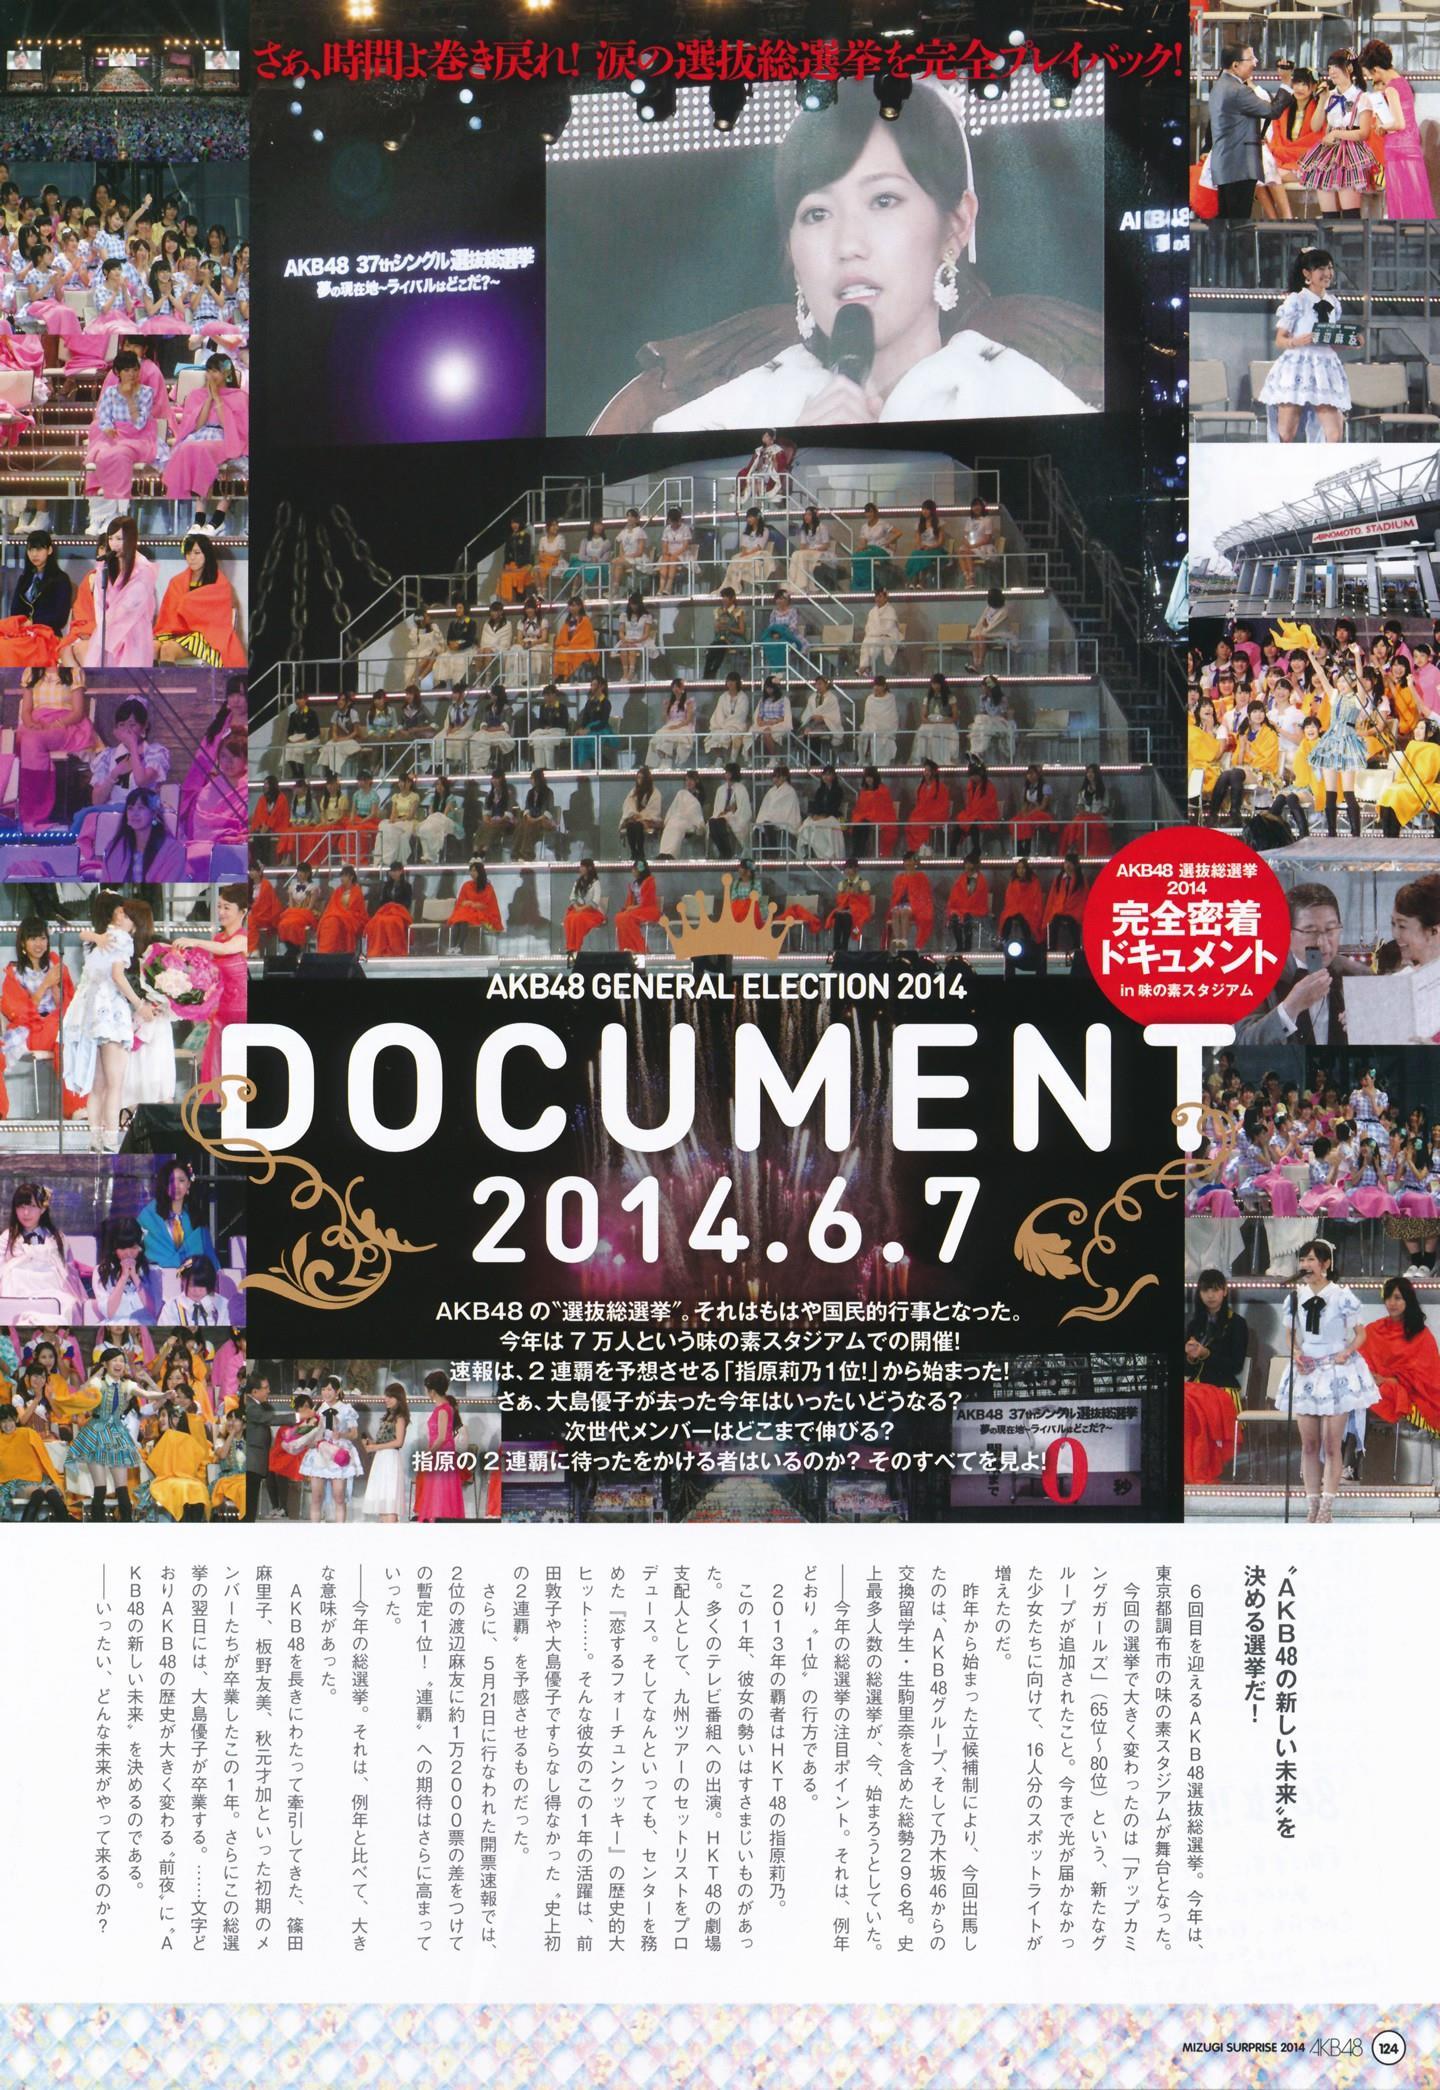 AKB48人気メンバー 画像 116